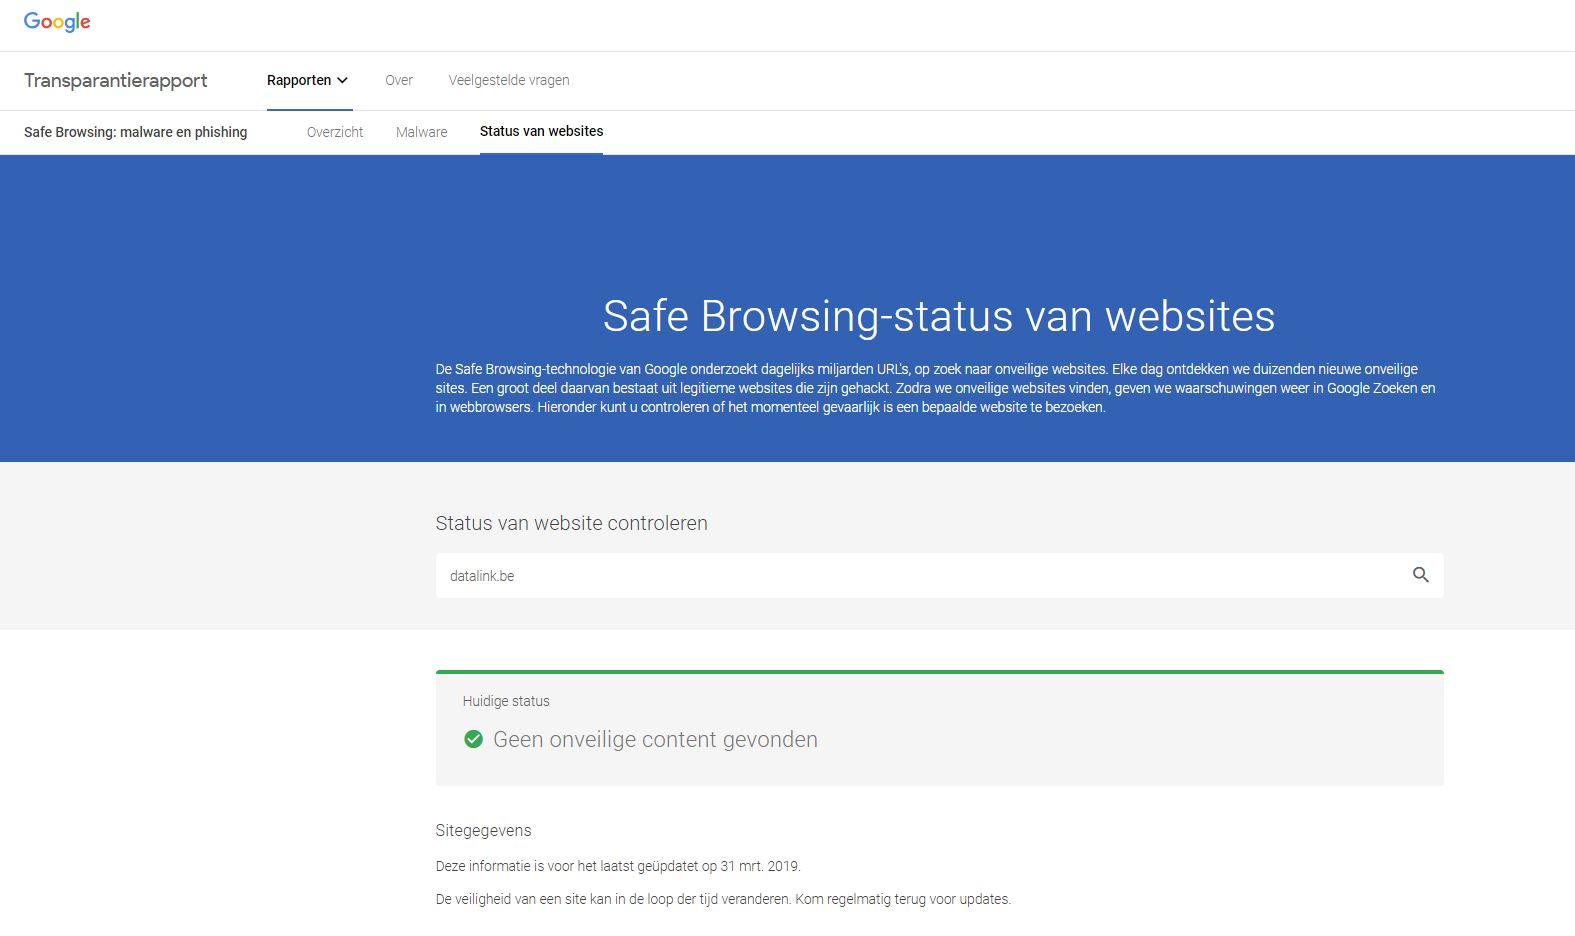 Transparantierapport Google_Datalink